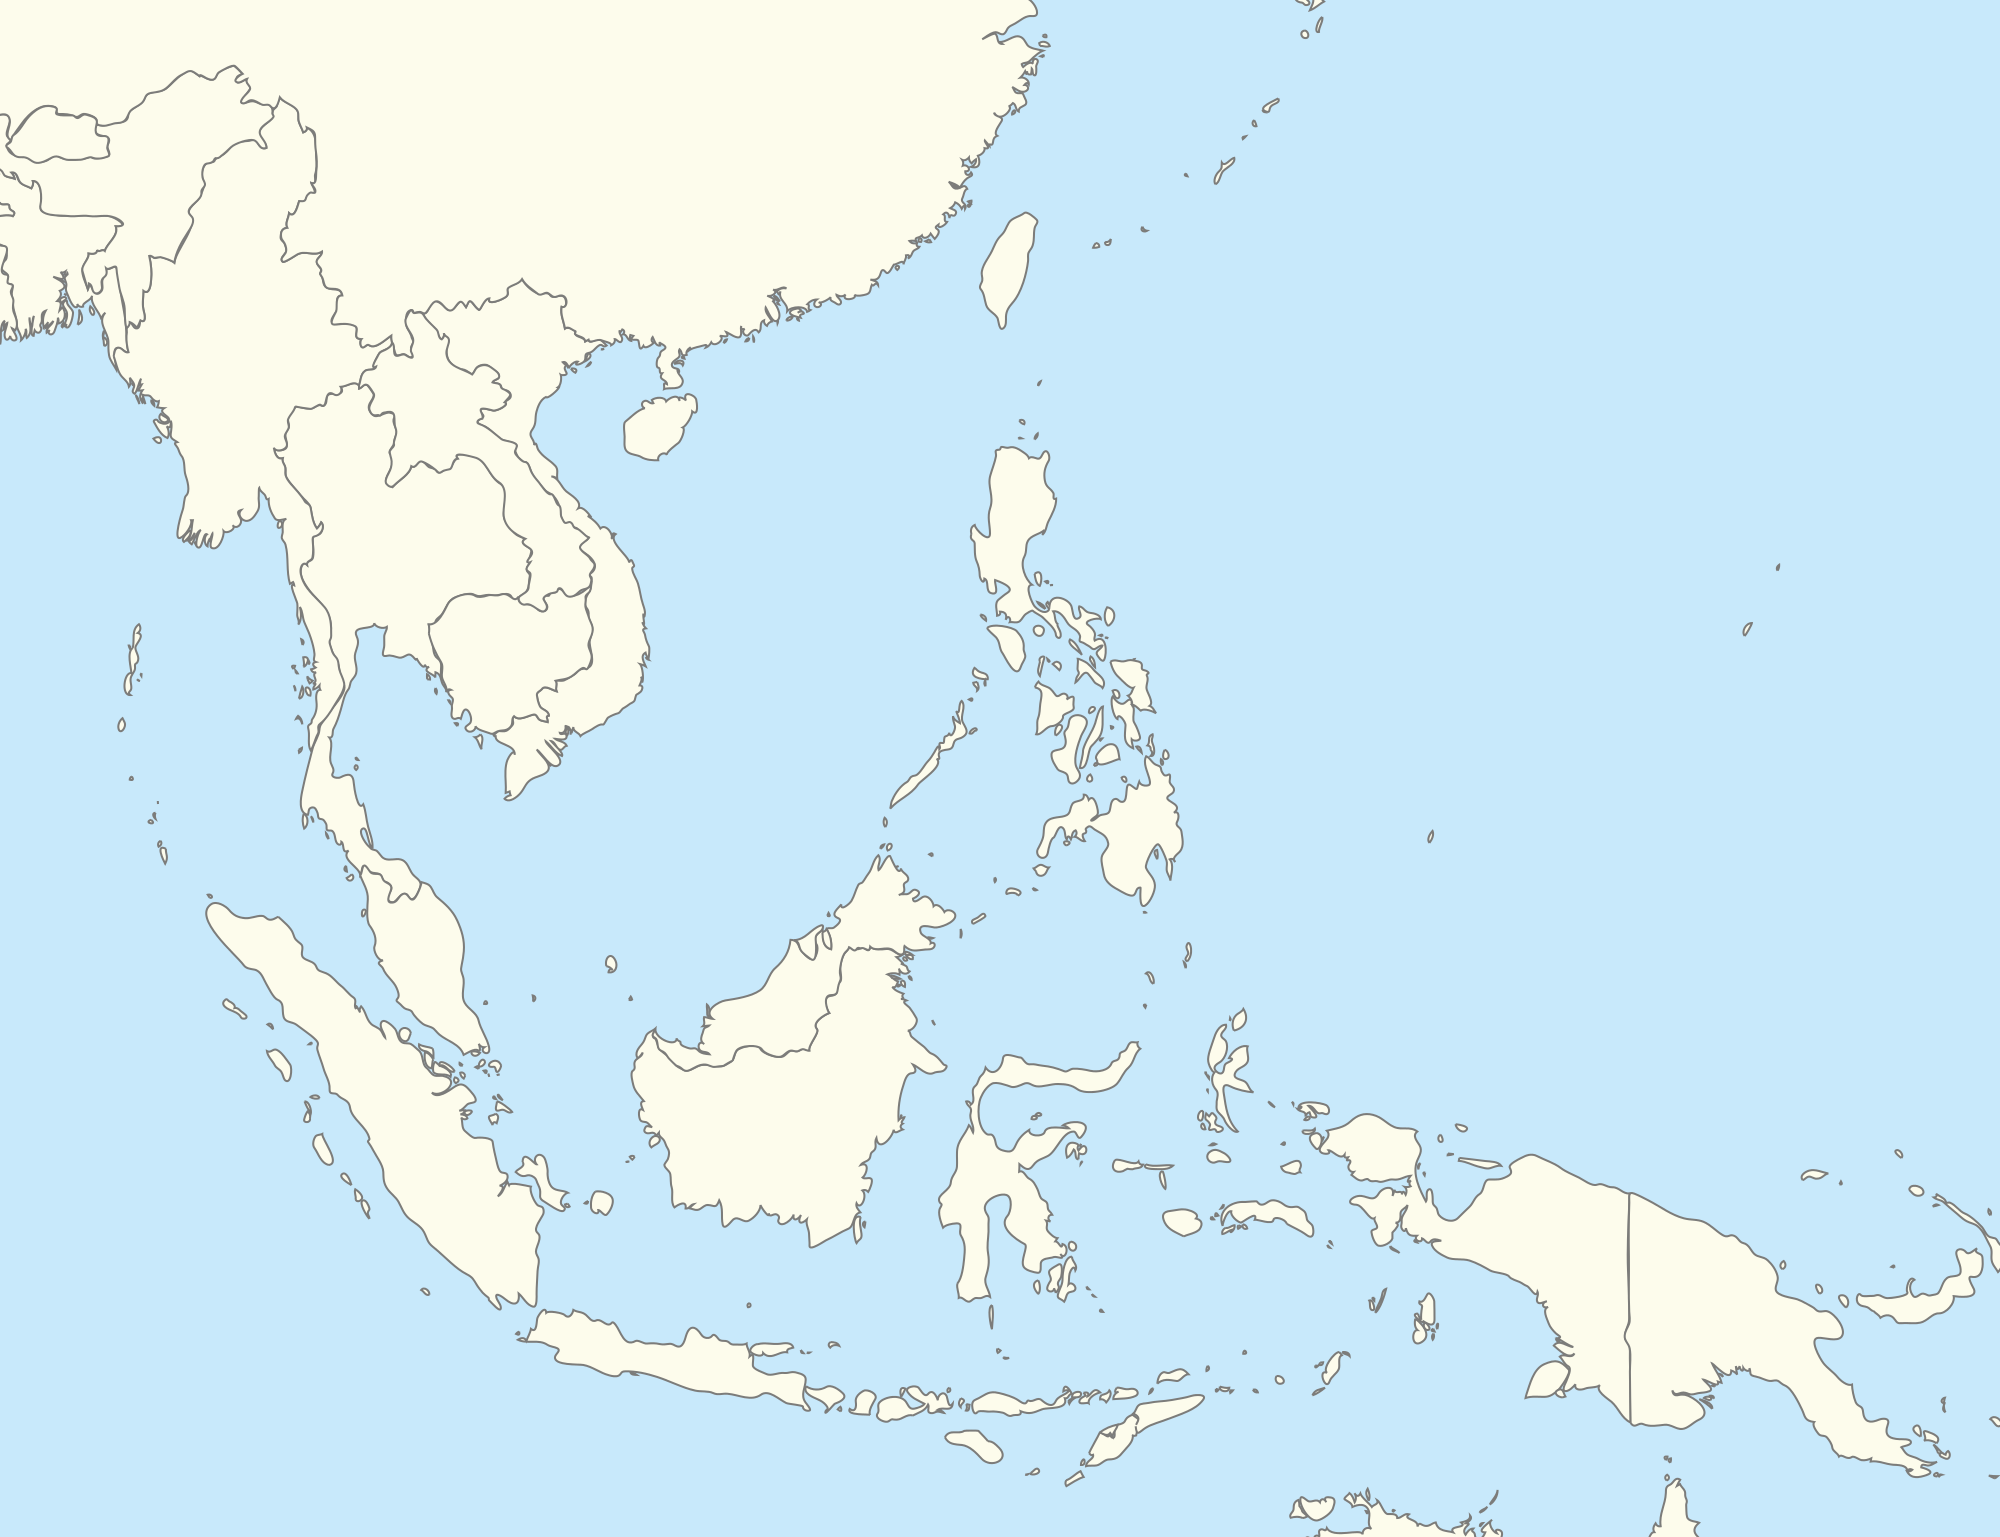 Jakarta Wikipedia Alive Museum Ancol Kota Administrasi Utara